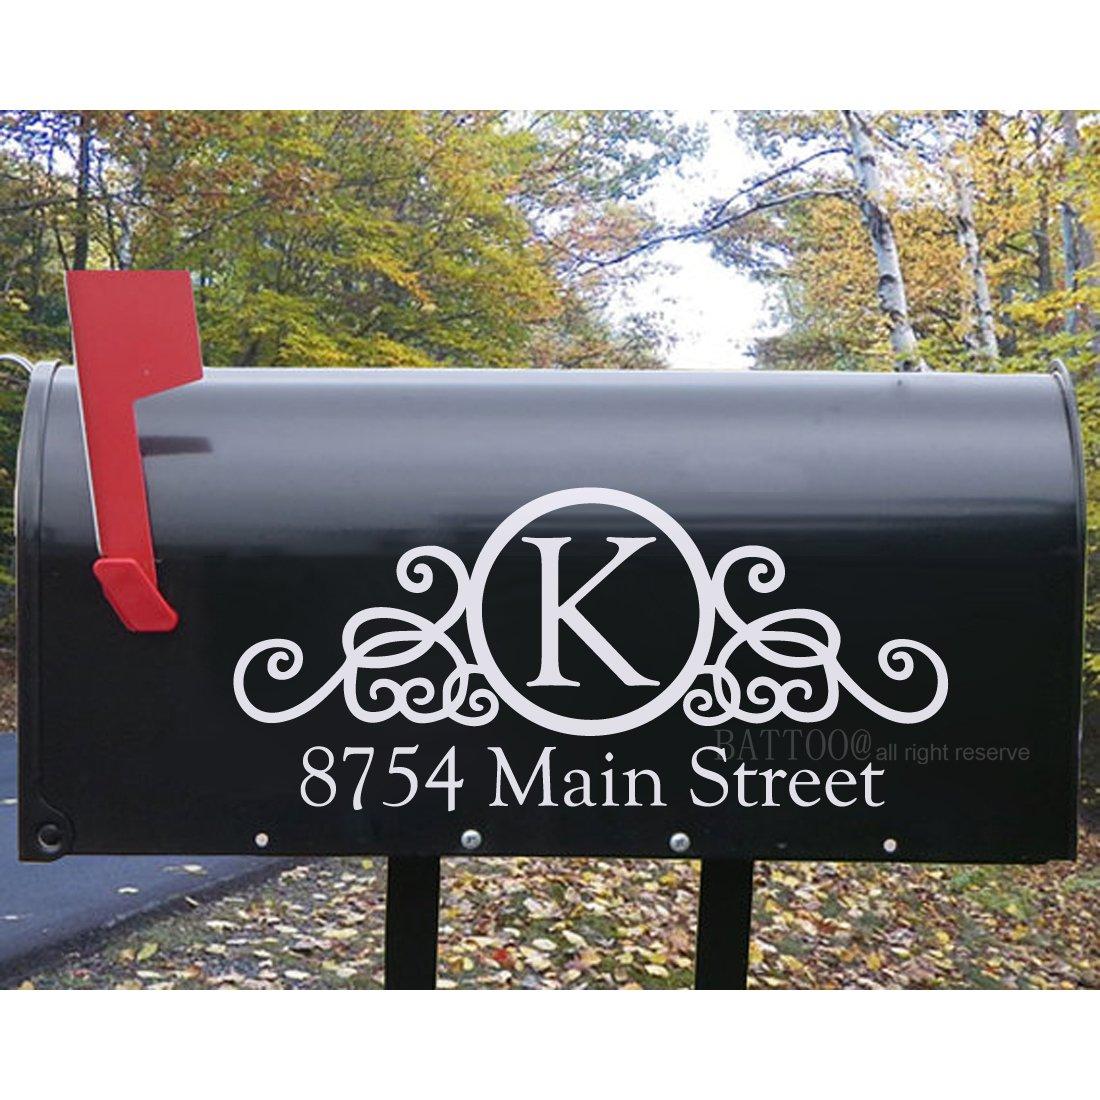 Battoo custom mailbox address vinyl decal stickers 10 w 4 5 h mail box vinyl numbers mailbox curb appeal mailbox decals house numbers home address plus